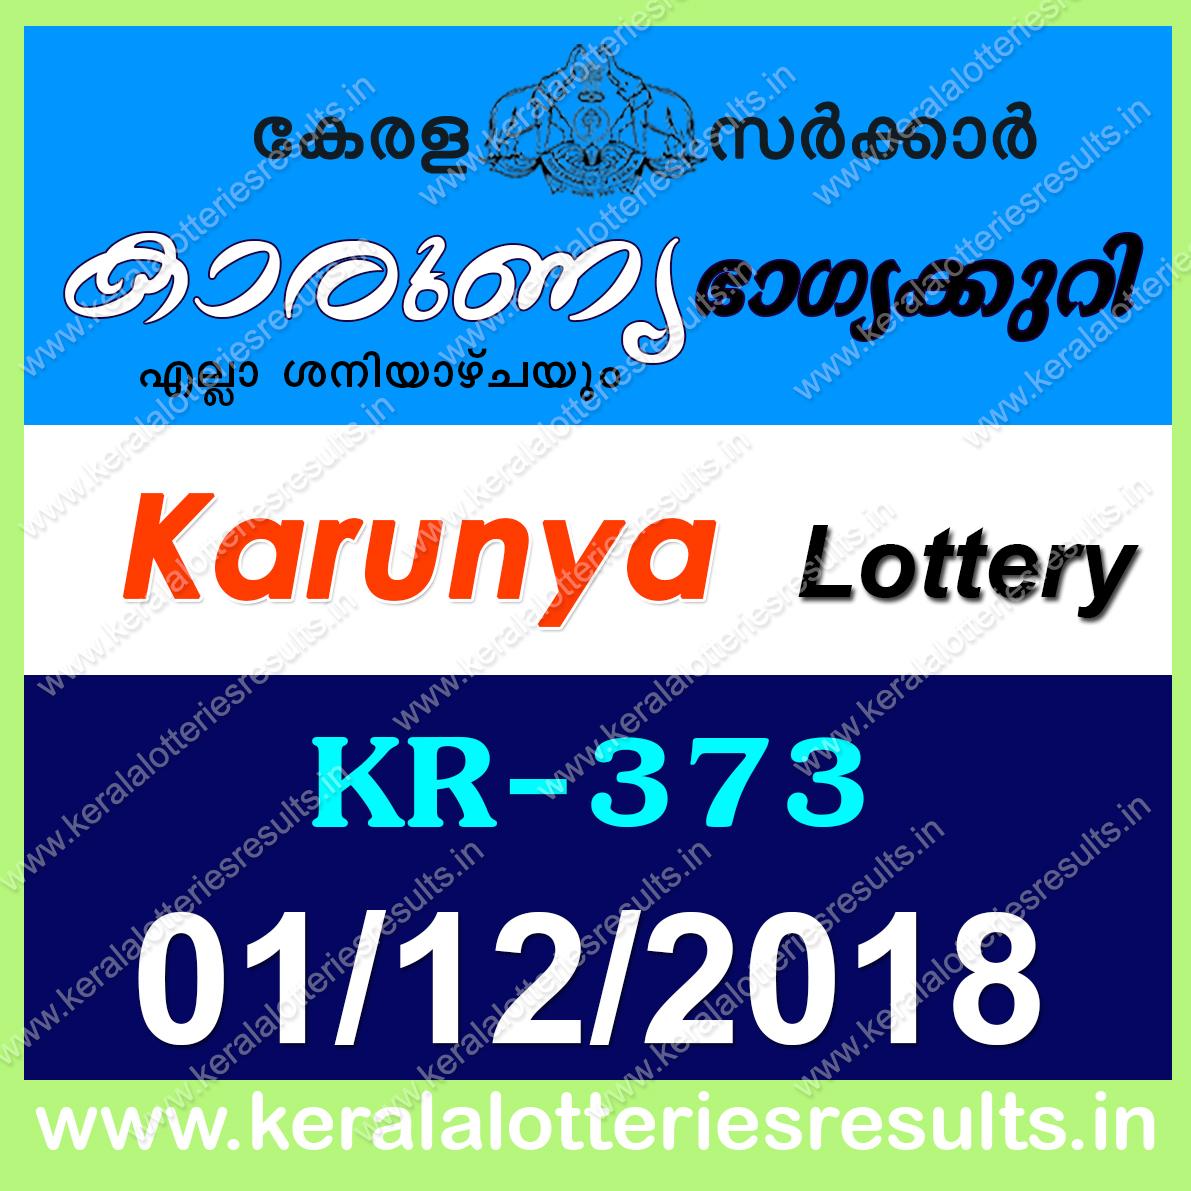 Kerala Lottery Result; 01.12.2018 Karunya Lottery Results